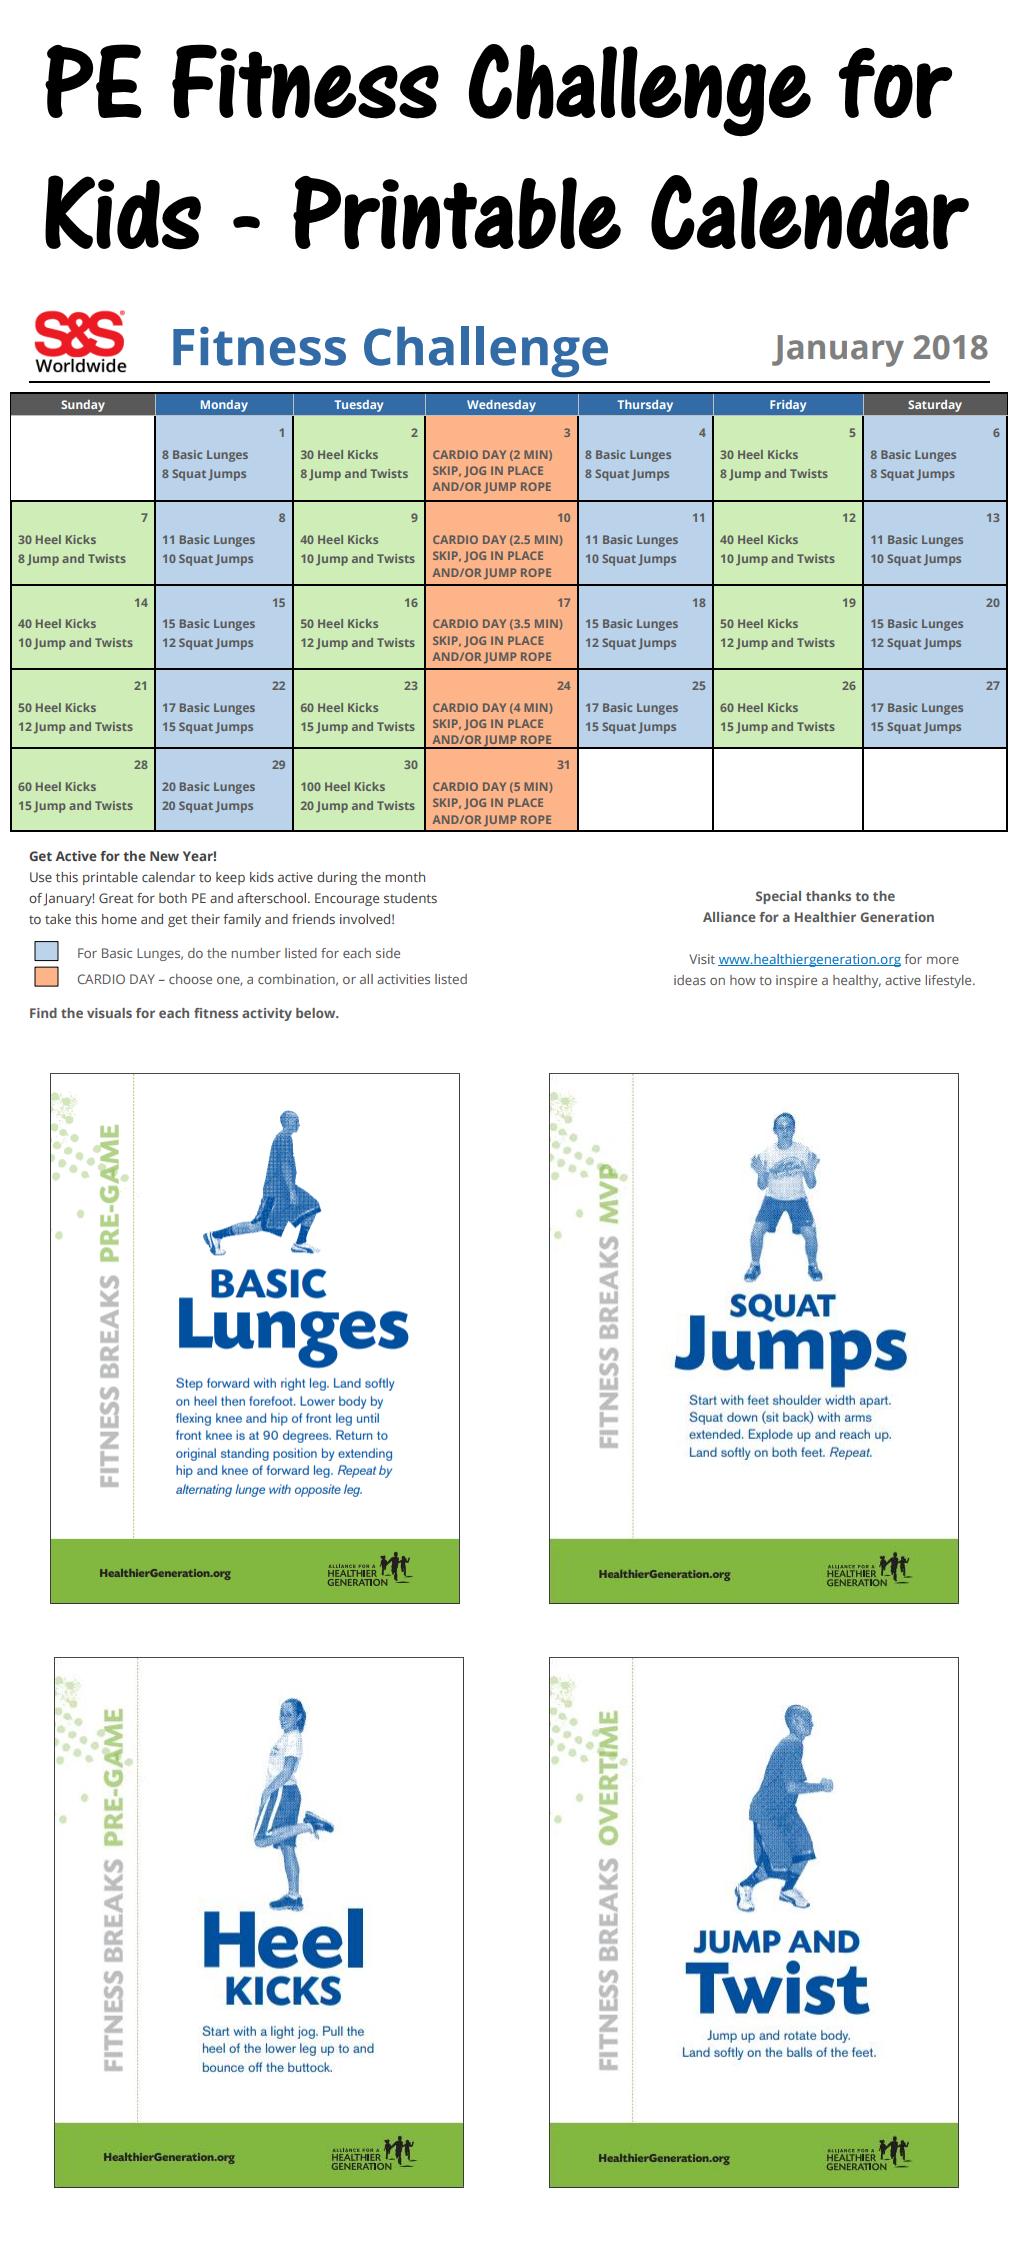 Printable Fitness Challenge Calendar For Kids - Keeping For Fitness Challenge Calendars For Students Pdf